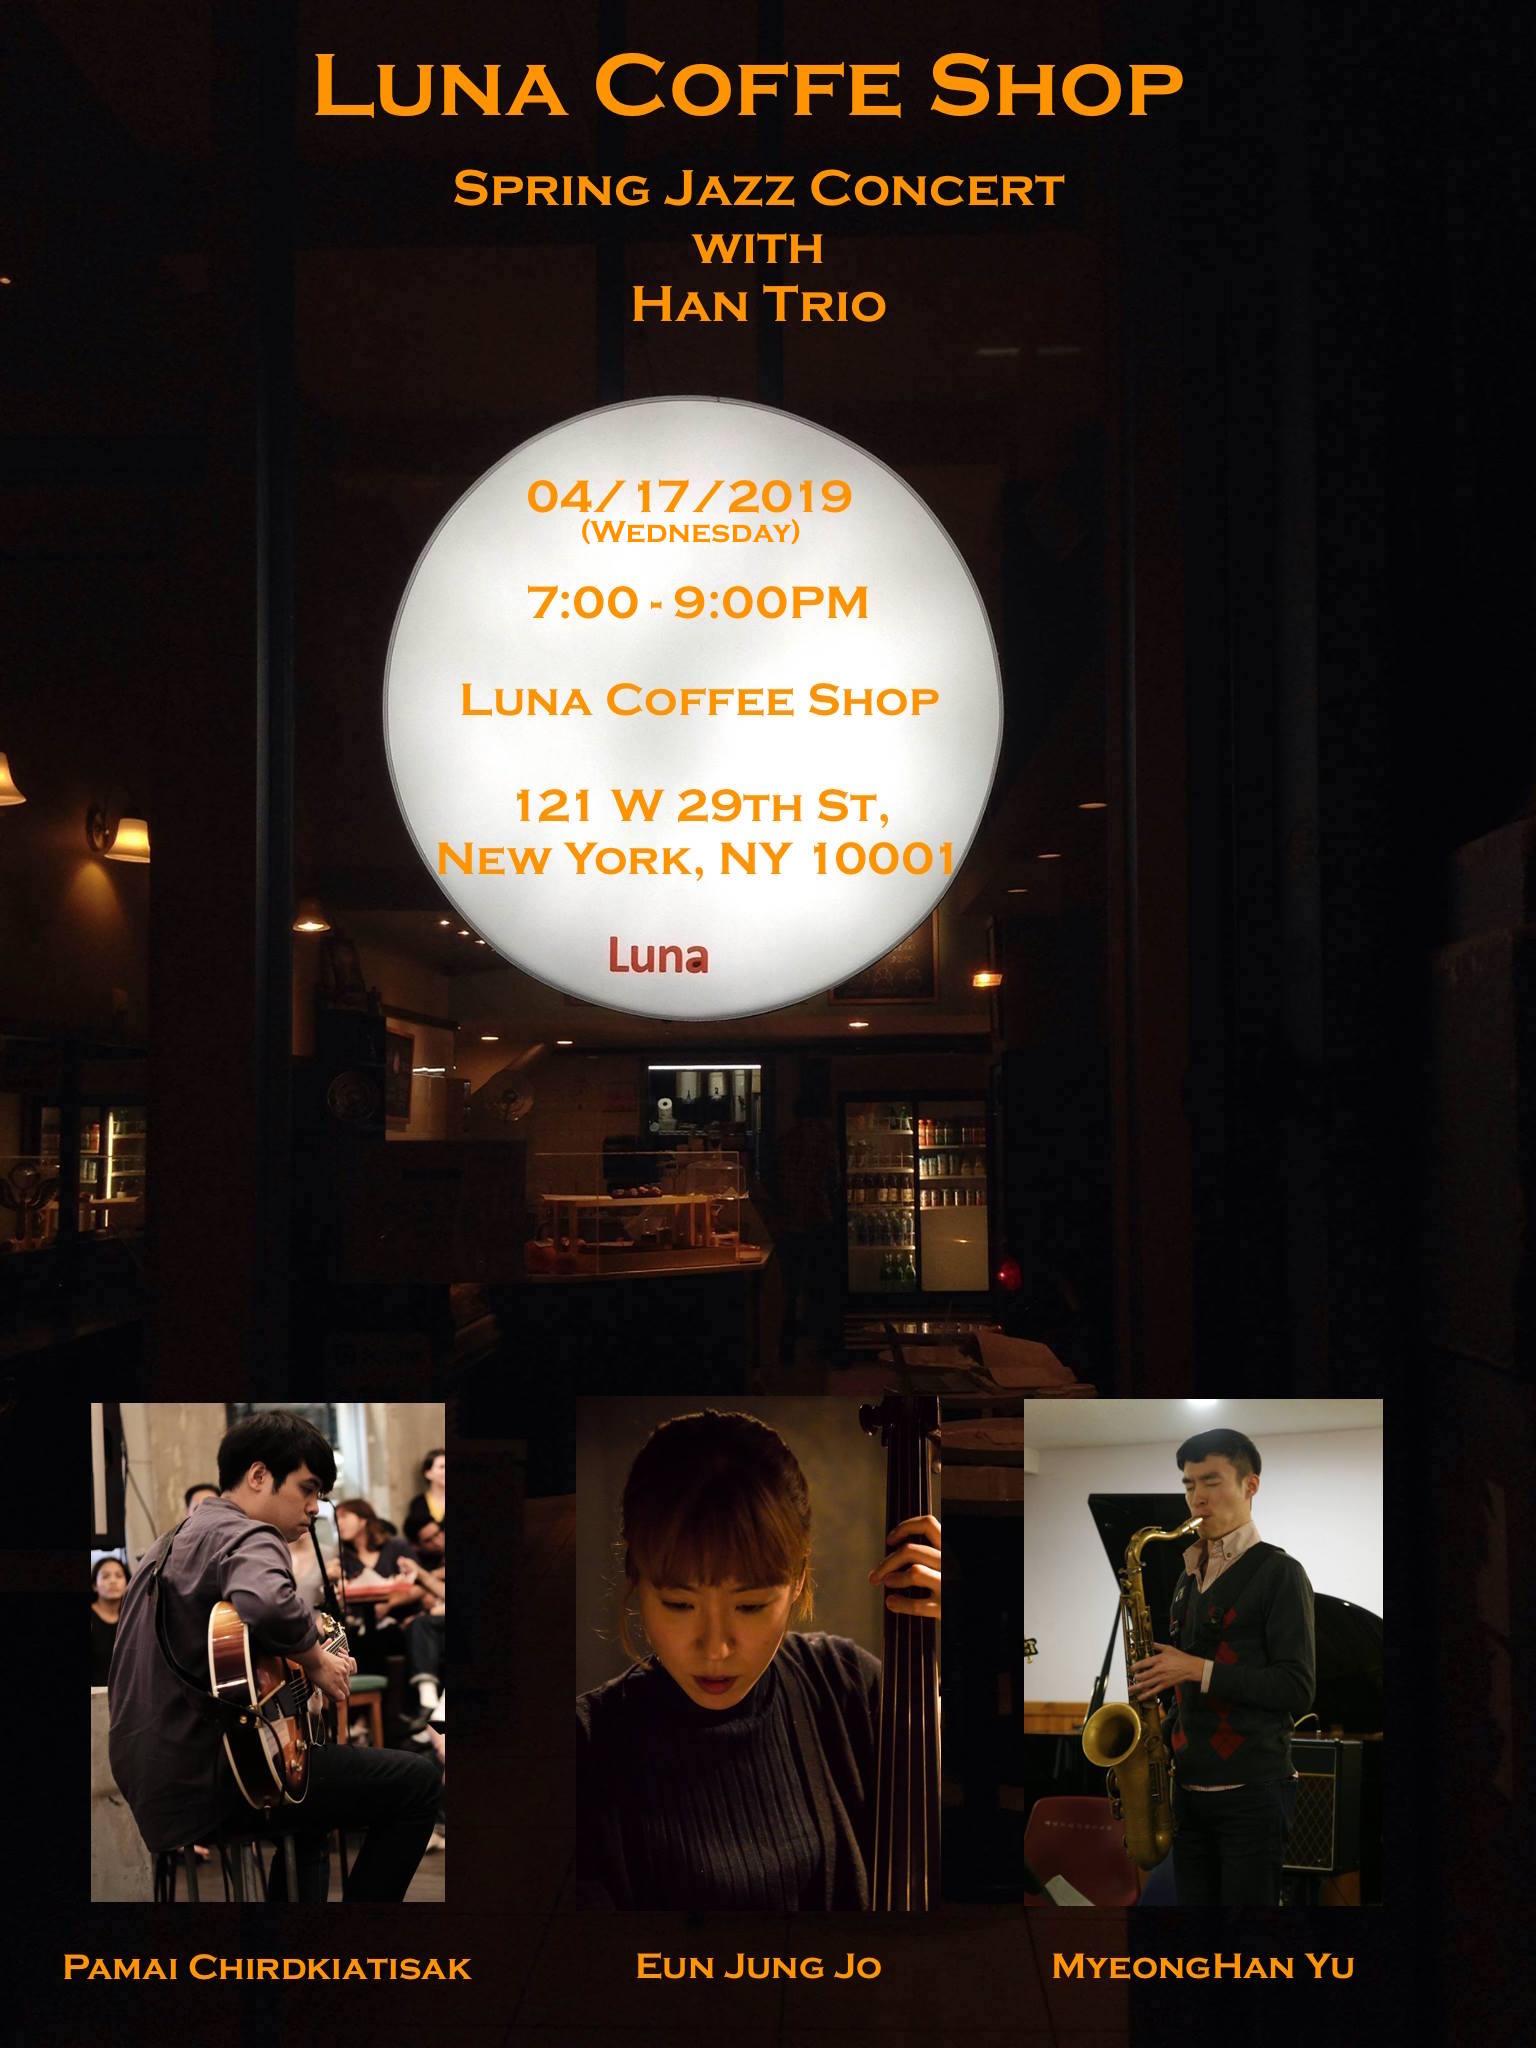 Han Trio Poster.jpg